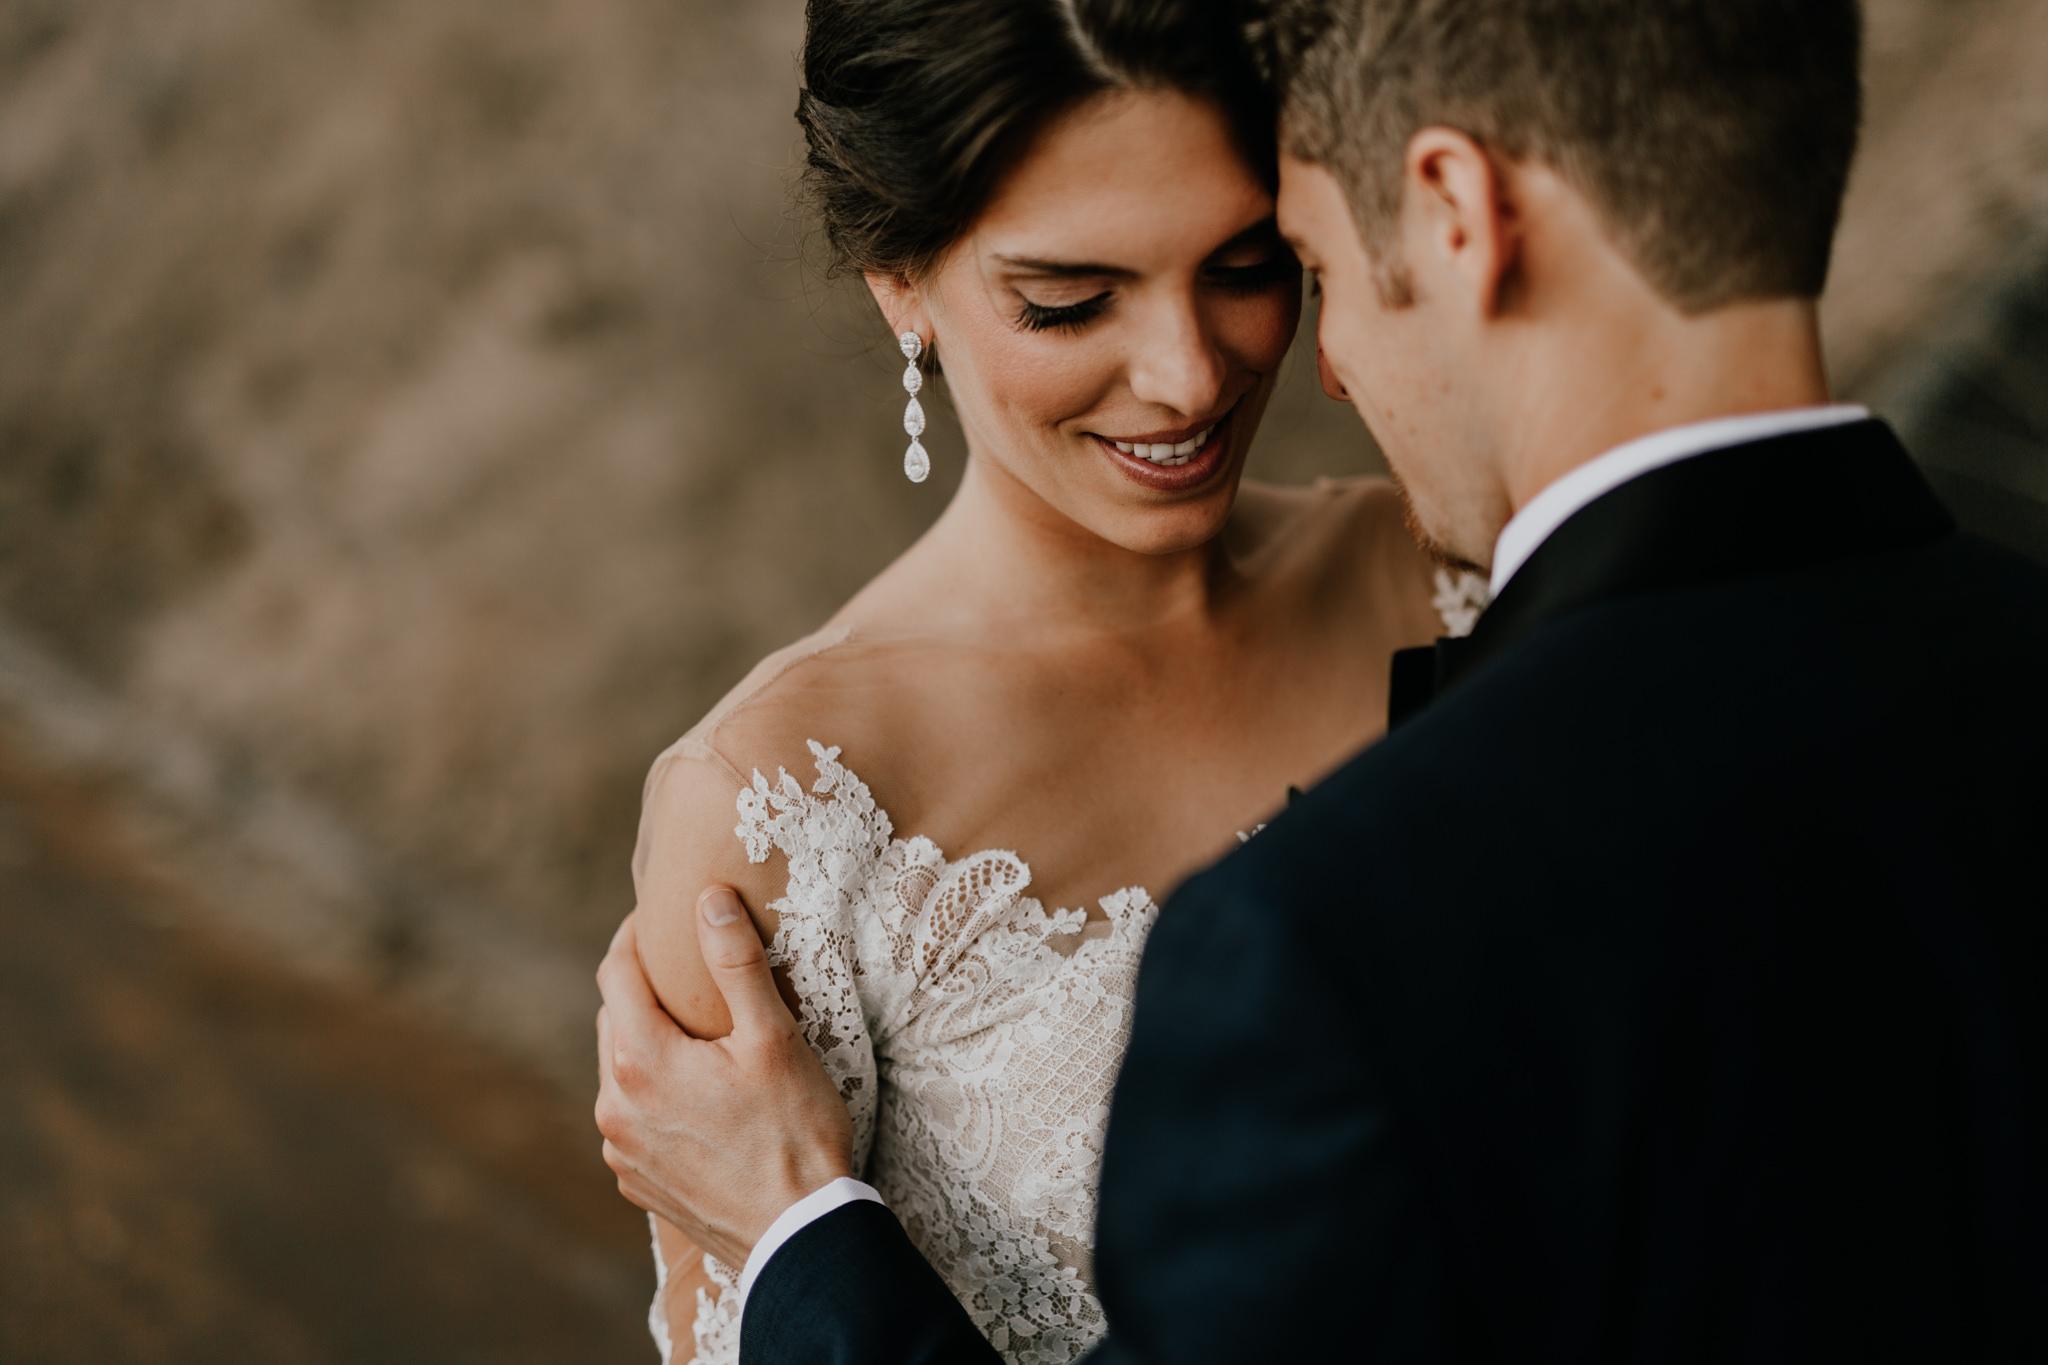 wedding-headlands-center-for-the-arts-sausalito-101.jpg